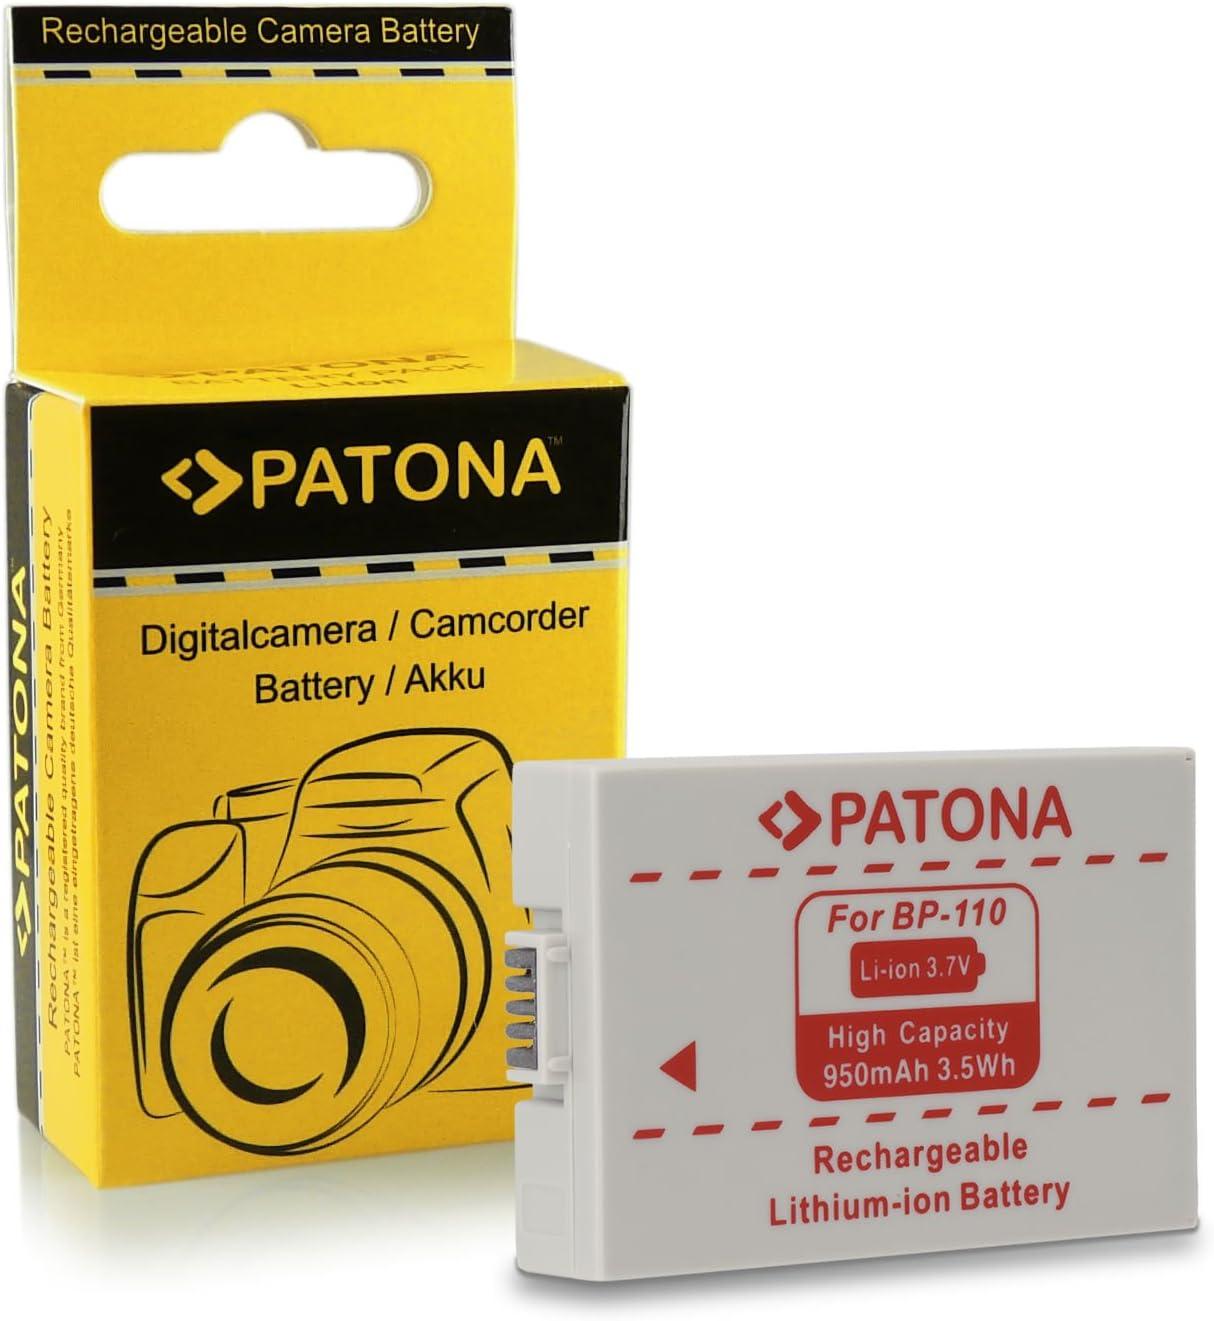 PATONA/® Battery BP-110/BP110/for Canon Legria HF R26HF R27 2x Battery 4 in 1 Charger HF R200/ Pack of 2 HF R206/Canon Vixia HF R20 HF R28/Canon Legria HF R205 HF R21